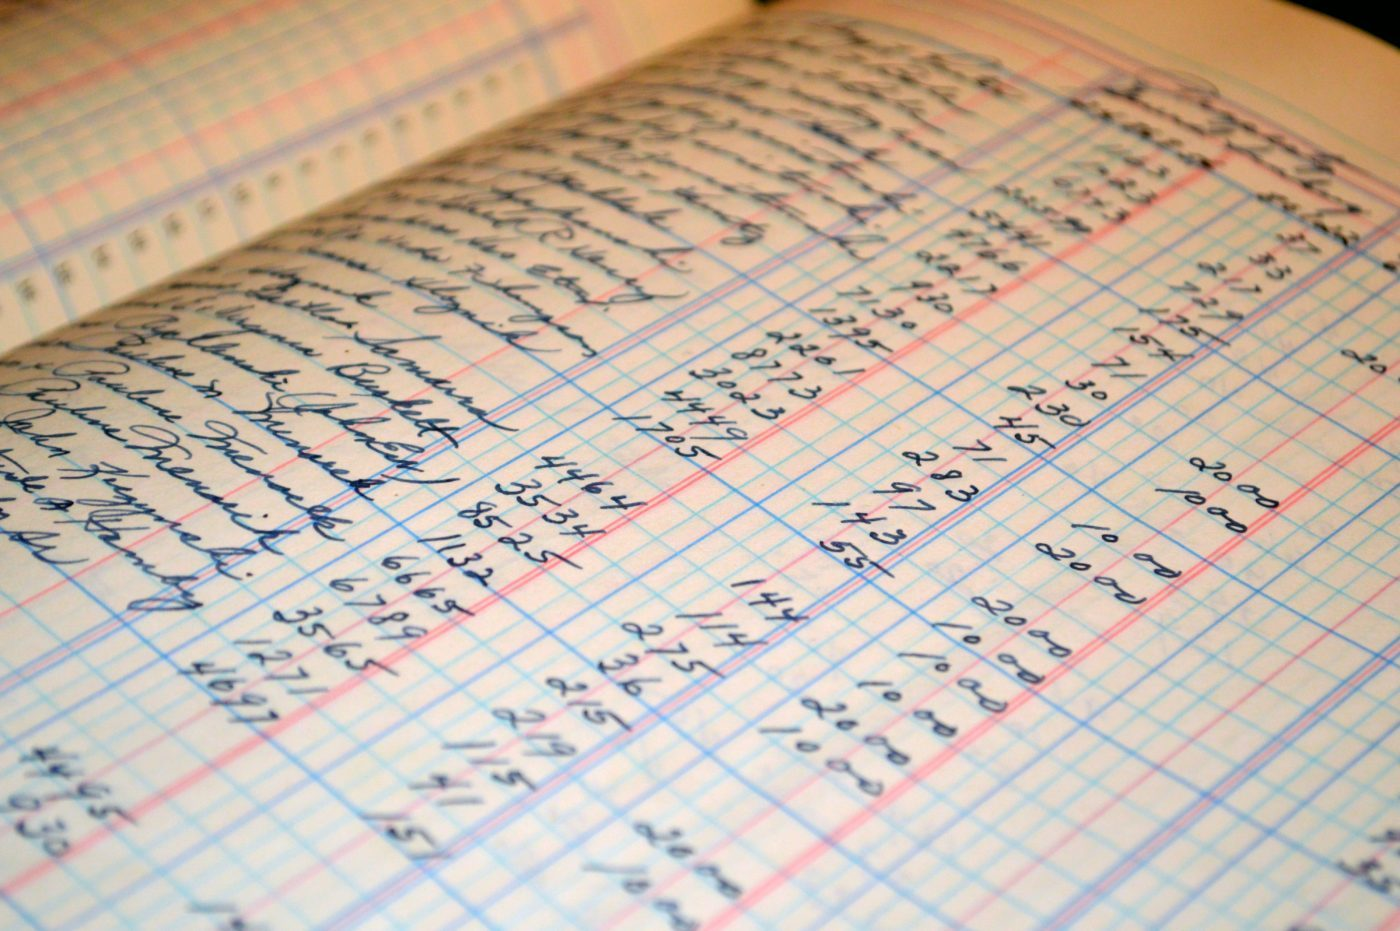 bancarotta documentale bilancio scritture contabili